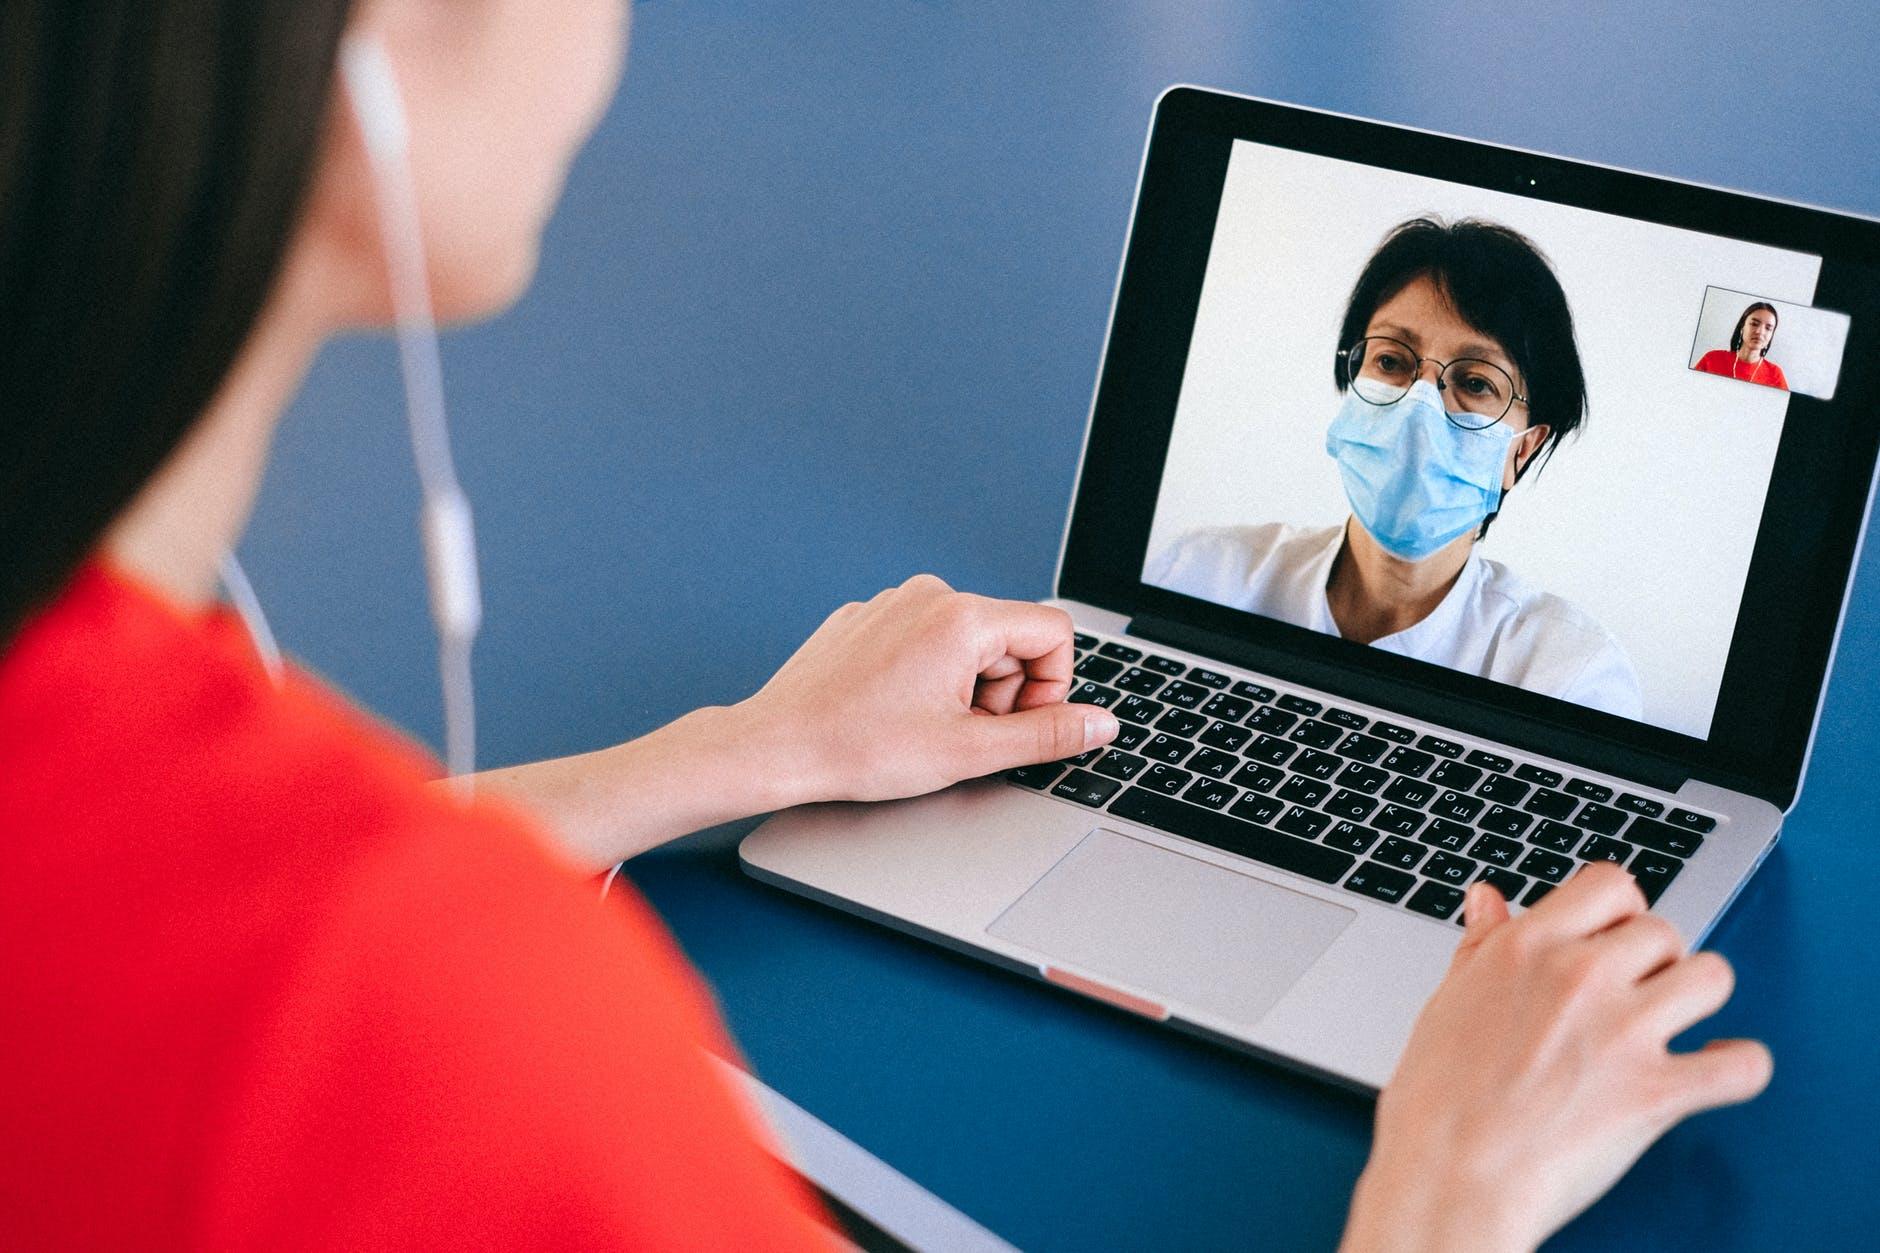 Advantages of using the Ninsaúde Apolo electronic medical record